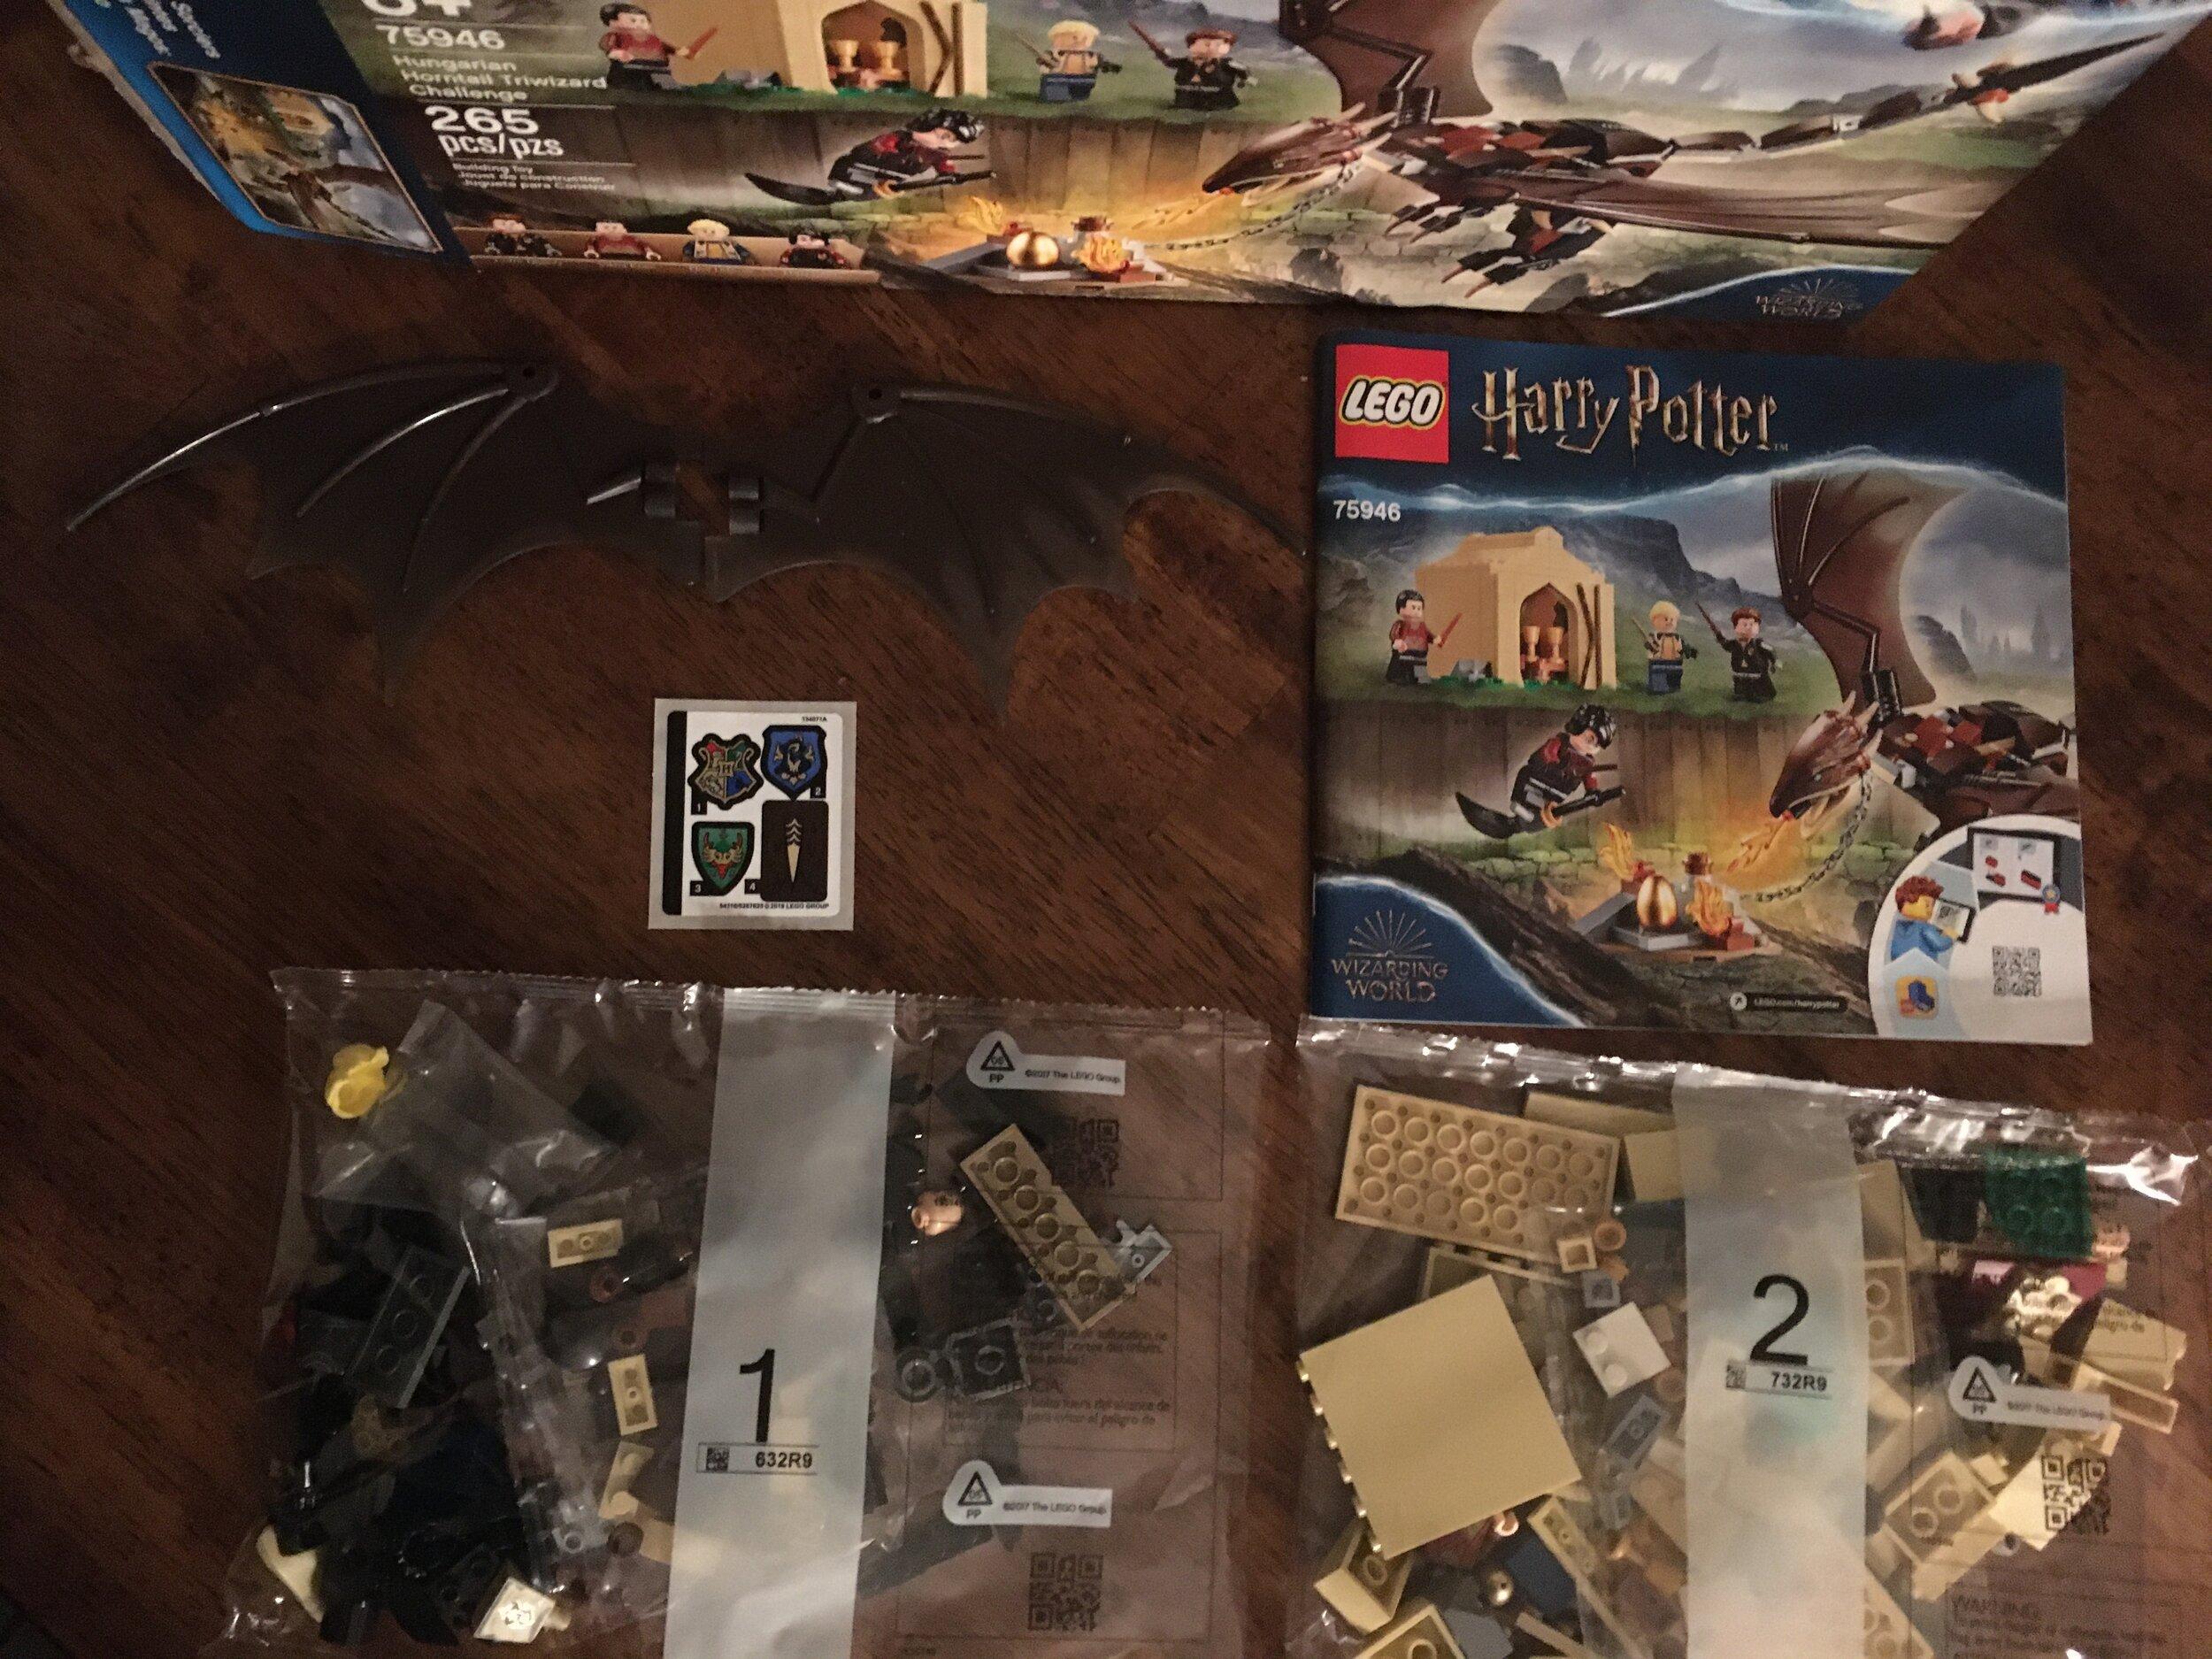 Lego Micro Figur aus Harry Potter 75 #